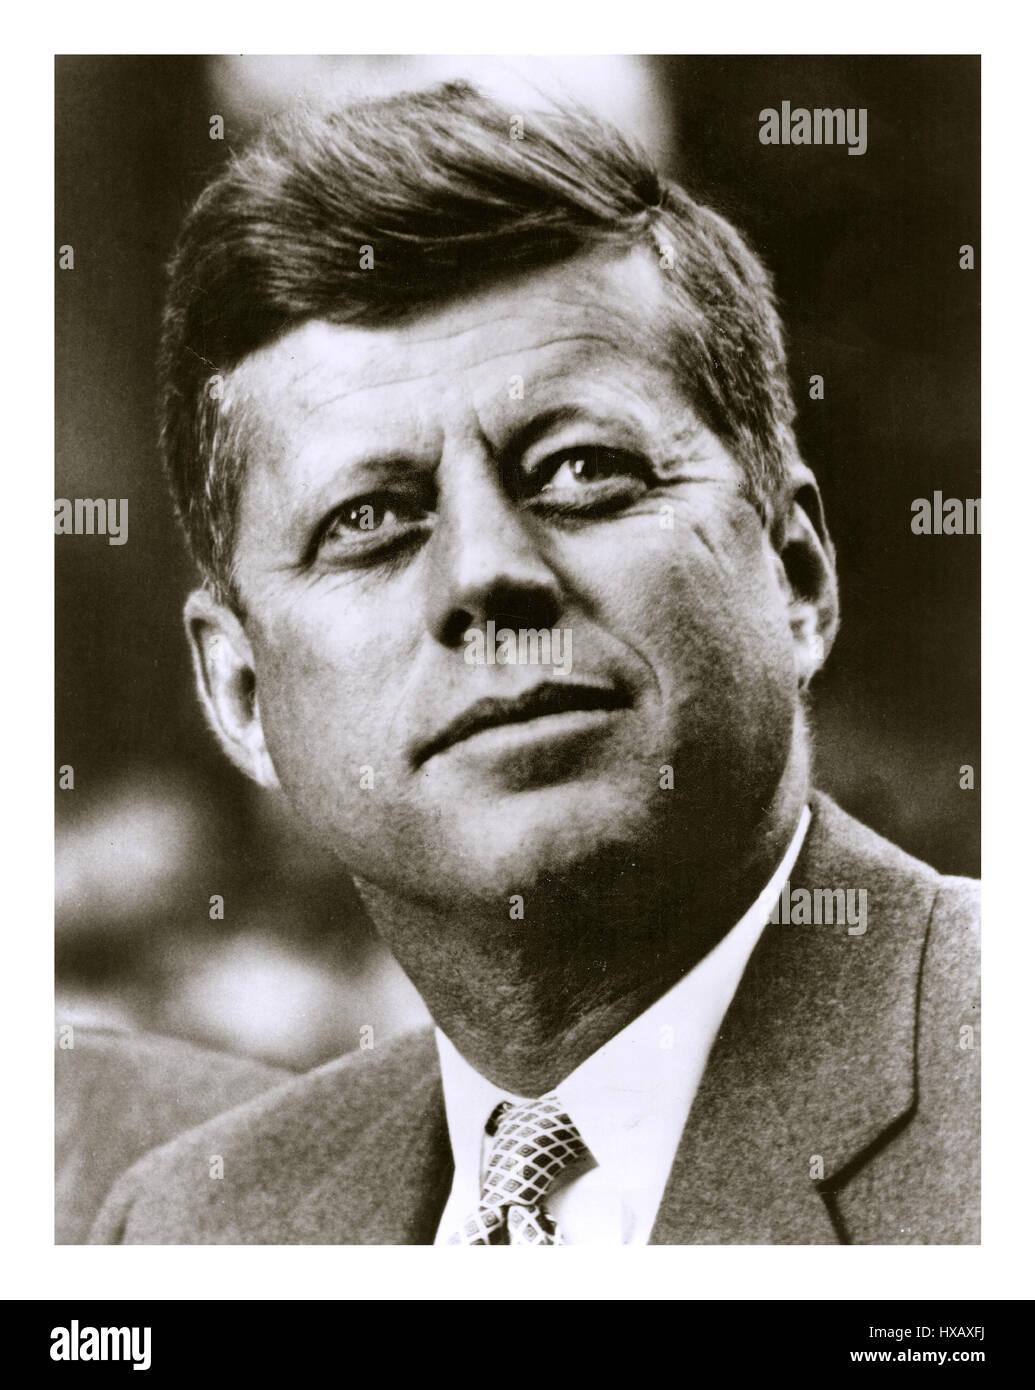 President John F. Kennedy Sept 1961 Informal head and shoulder b&w portrait exterior outdoors. - Stock Image